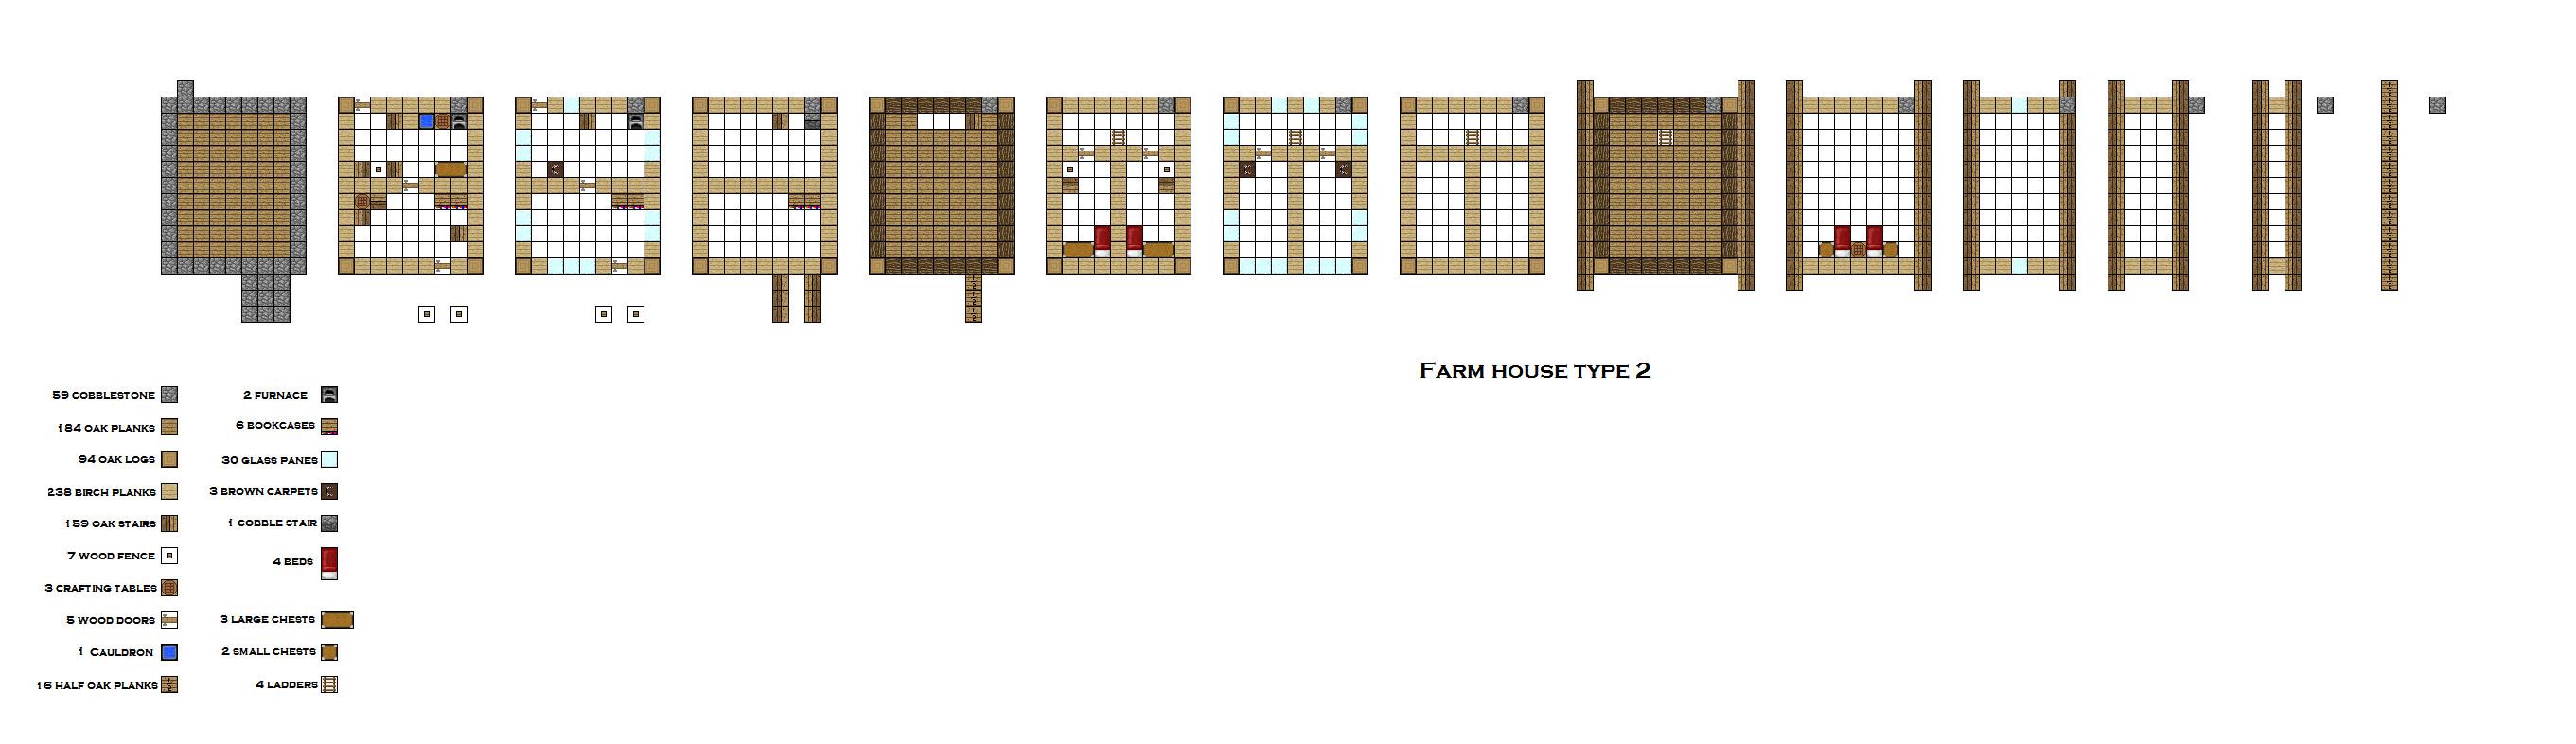 Npc village buildings by coltcoyote on deviantart apps directories - Coltcoyote 57 26 Mk 2 Farmhouse For 64 X 64 Farm By Coltcoyote Minecraft Floorplans